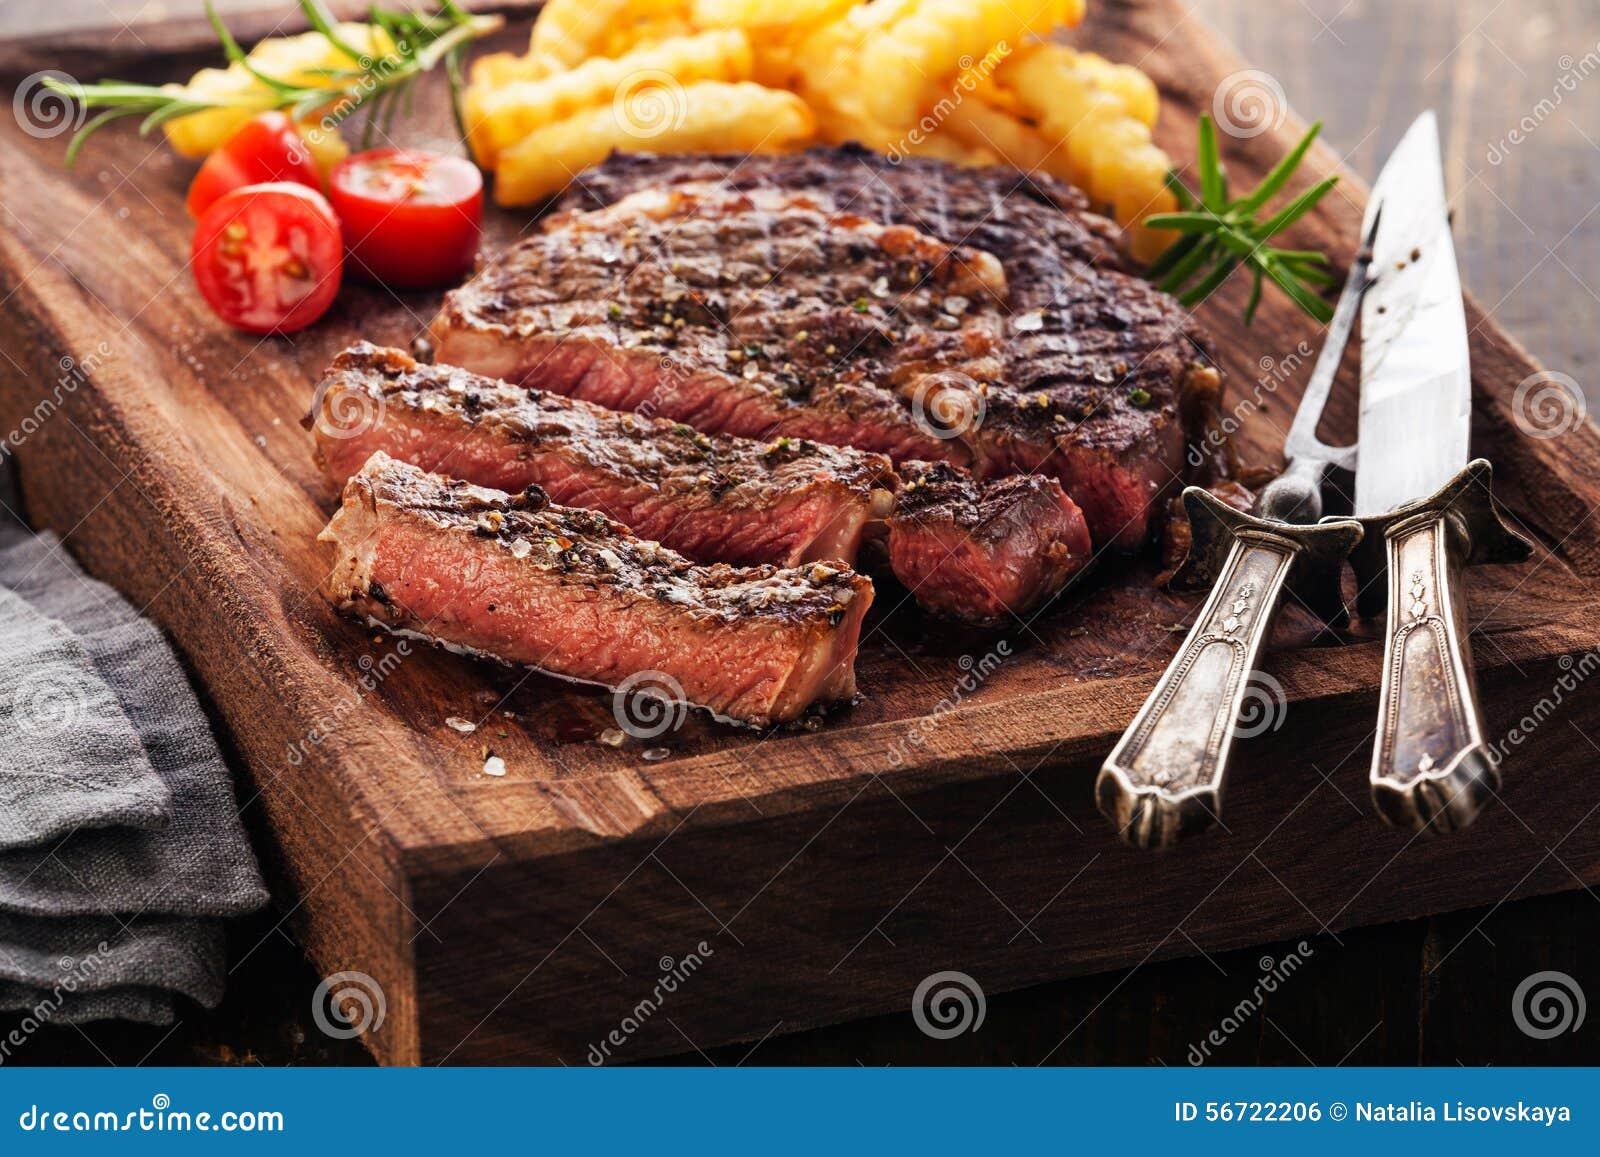 Bife grelhado raro médio cortado Ribeye com batatas fritas